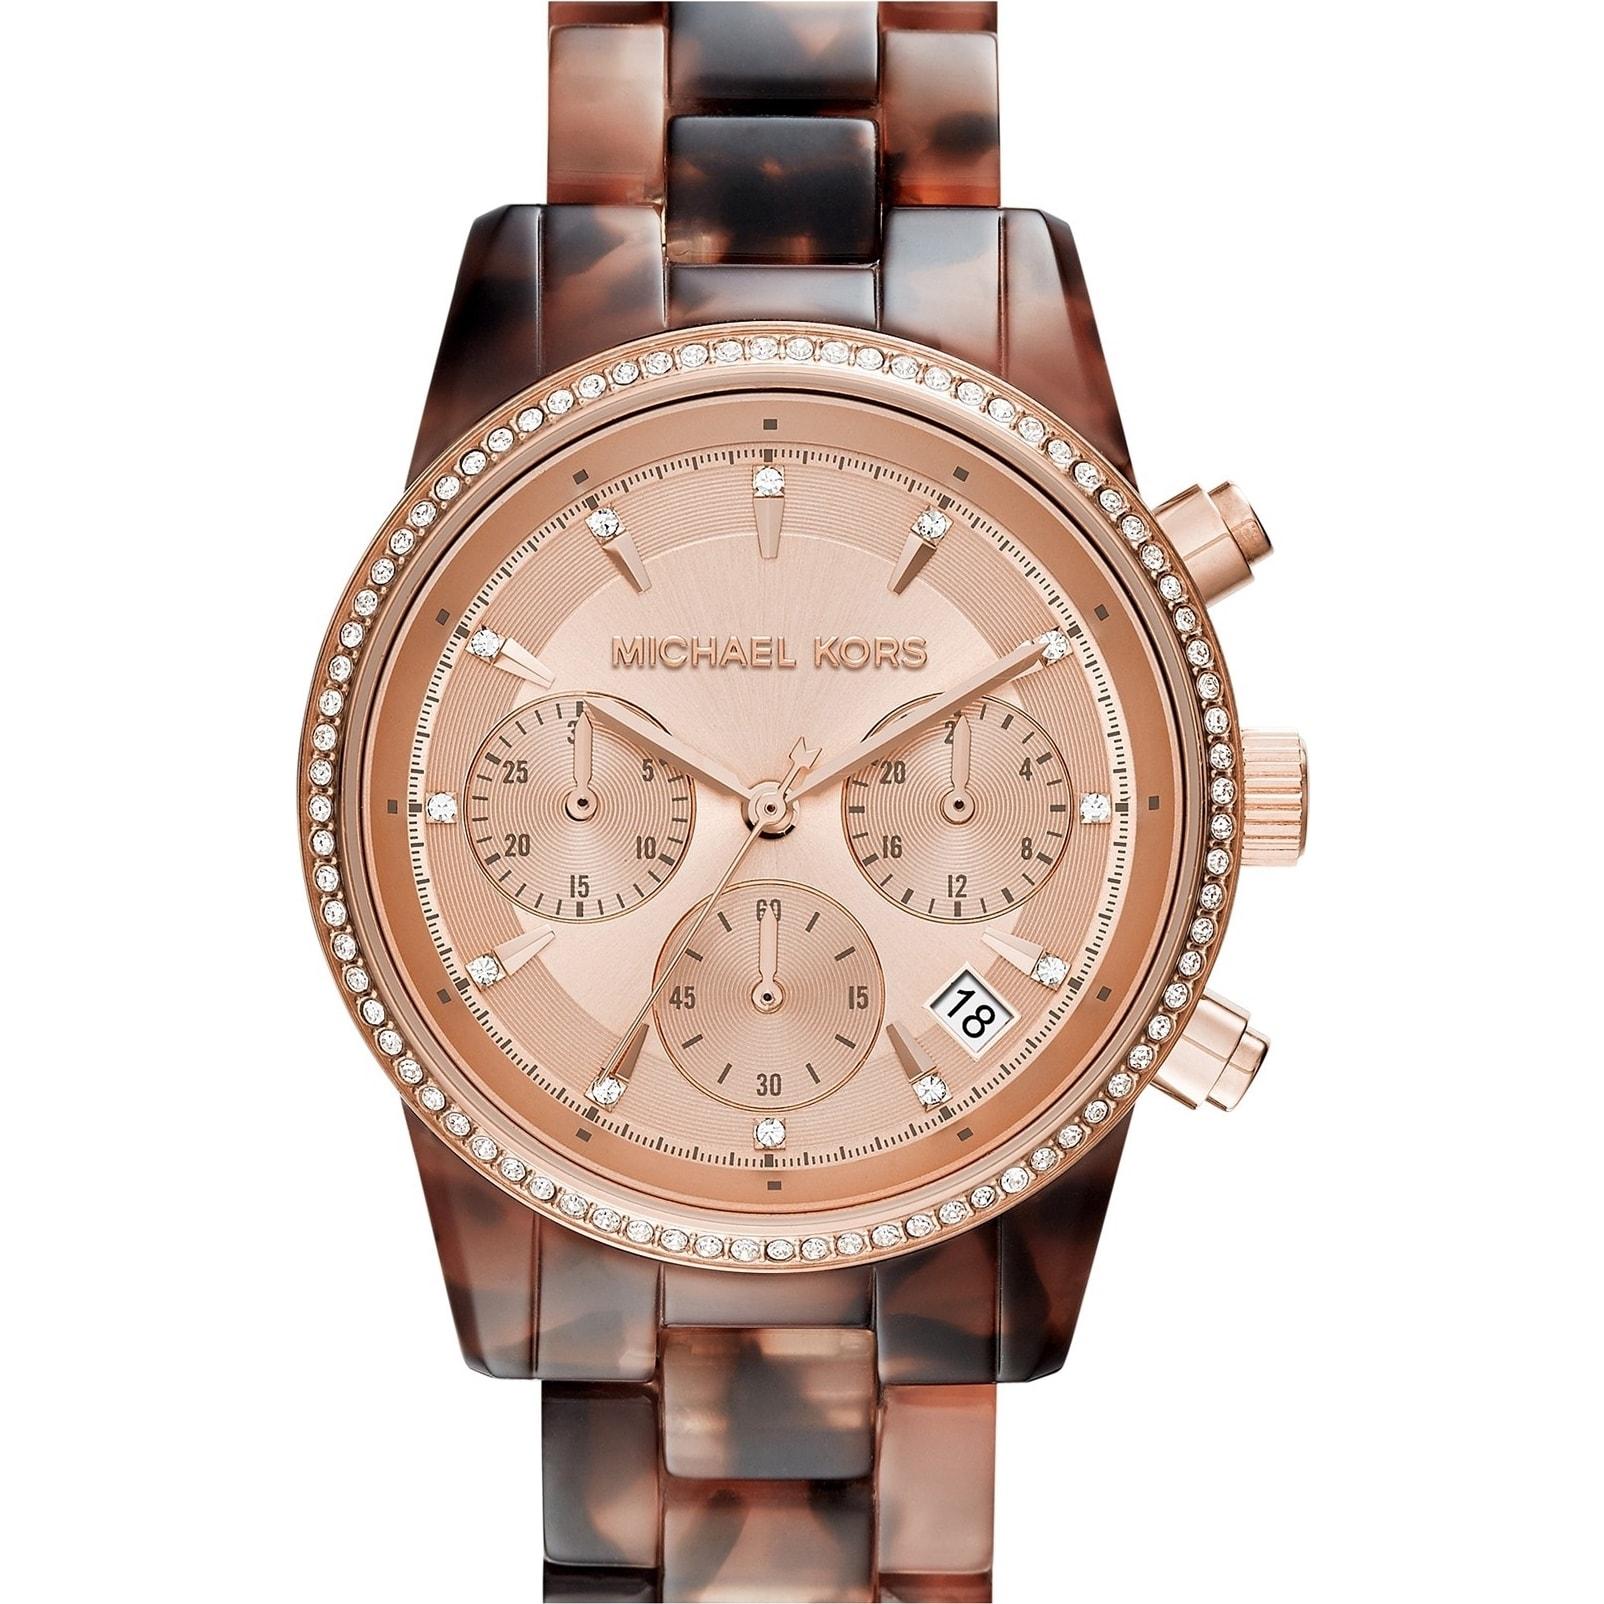 9c2a9a74d42 Shop Michael Kors Women s Ritz Diamond Chronograph Rose-Tone Gold Dial  Tortoise Acetate Bracelet Watch - Free Shipping Today - Overstock.com -  10680875